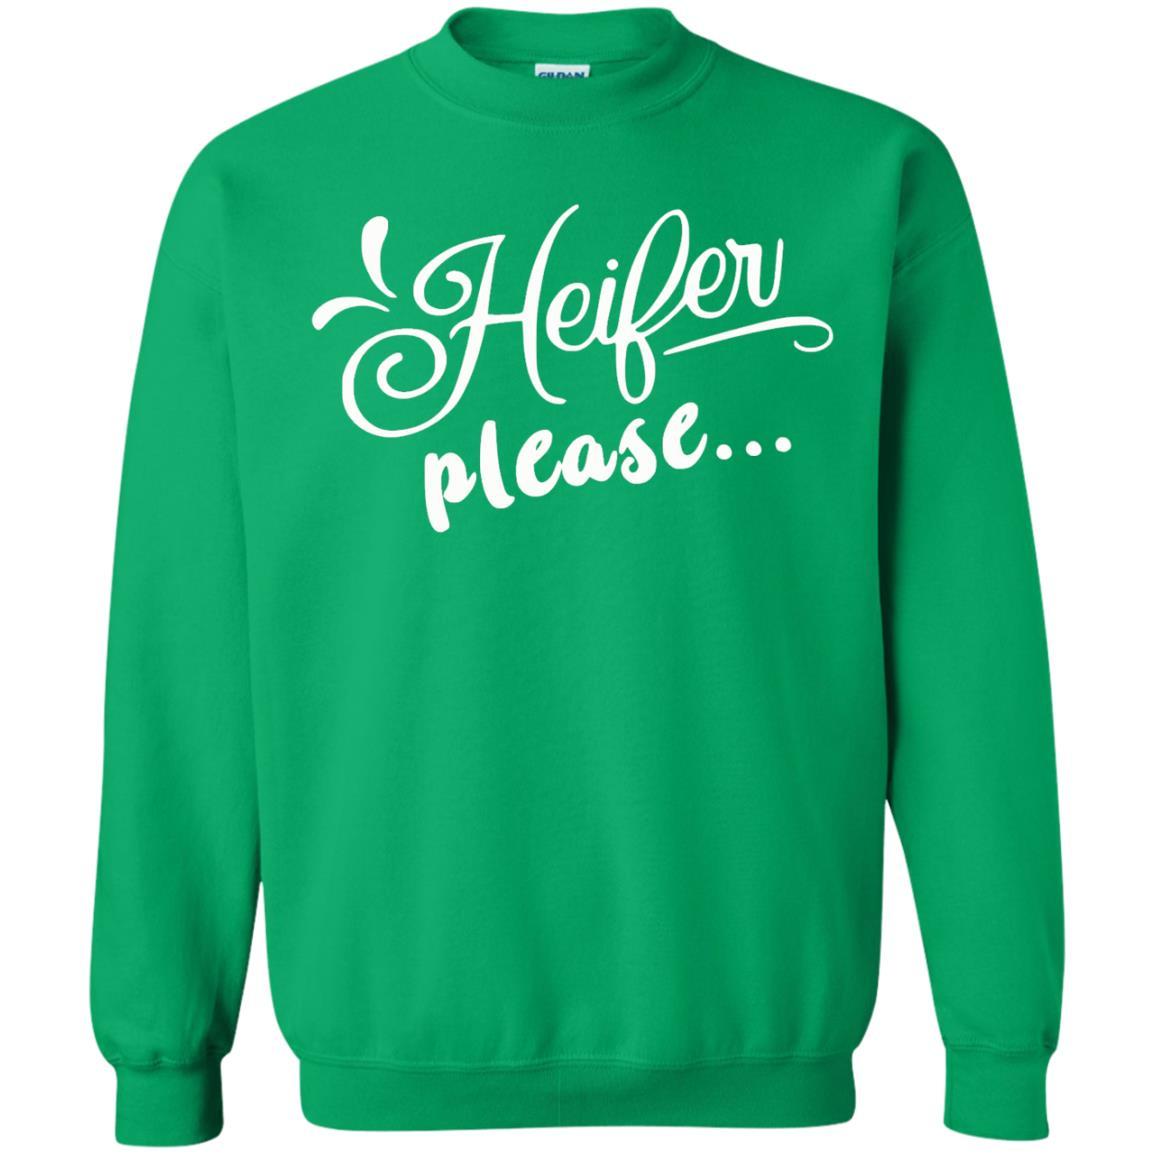 image 2153 - Heifer Please shirt, sweater: funny farmer apparel